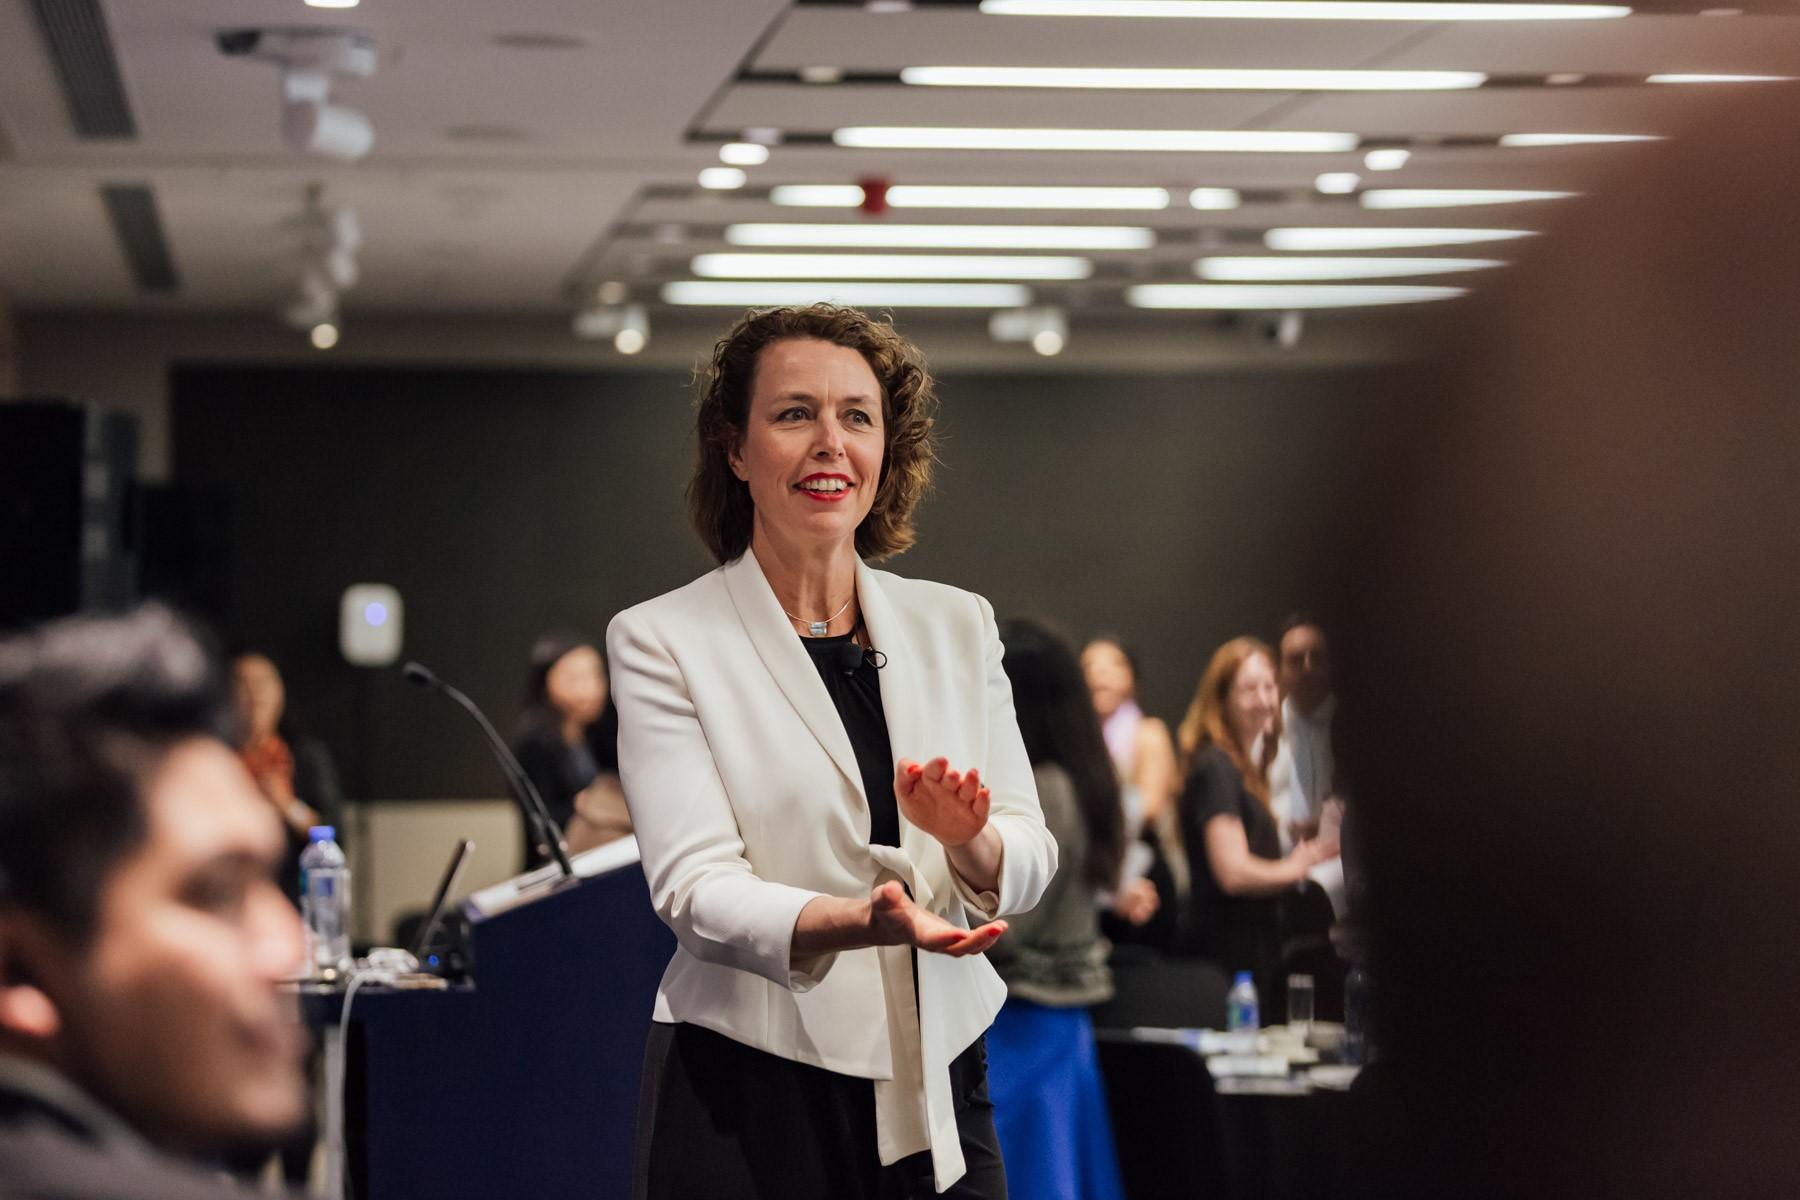 Lucy Cornell Keynote Speaker on Voice in Hong Kong